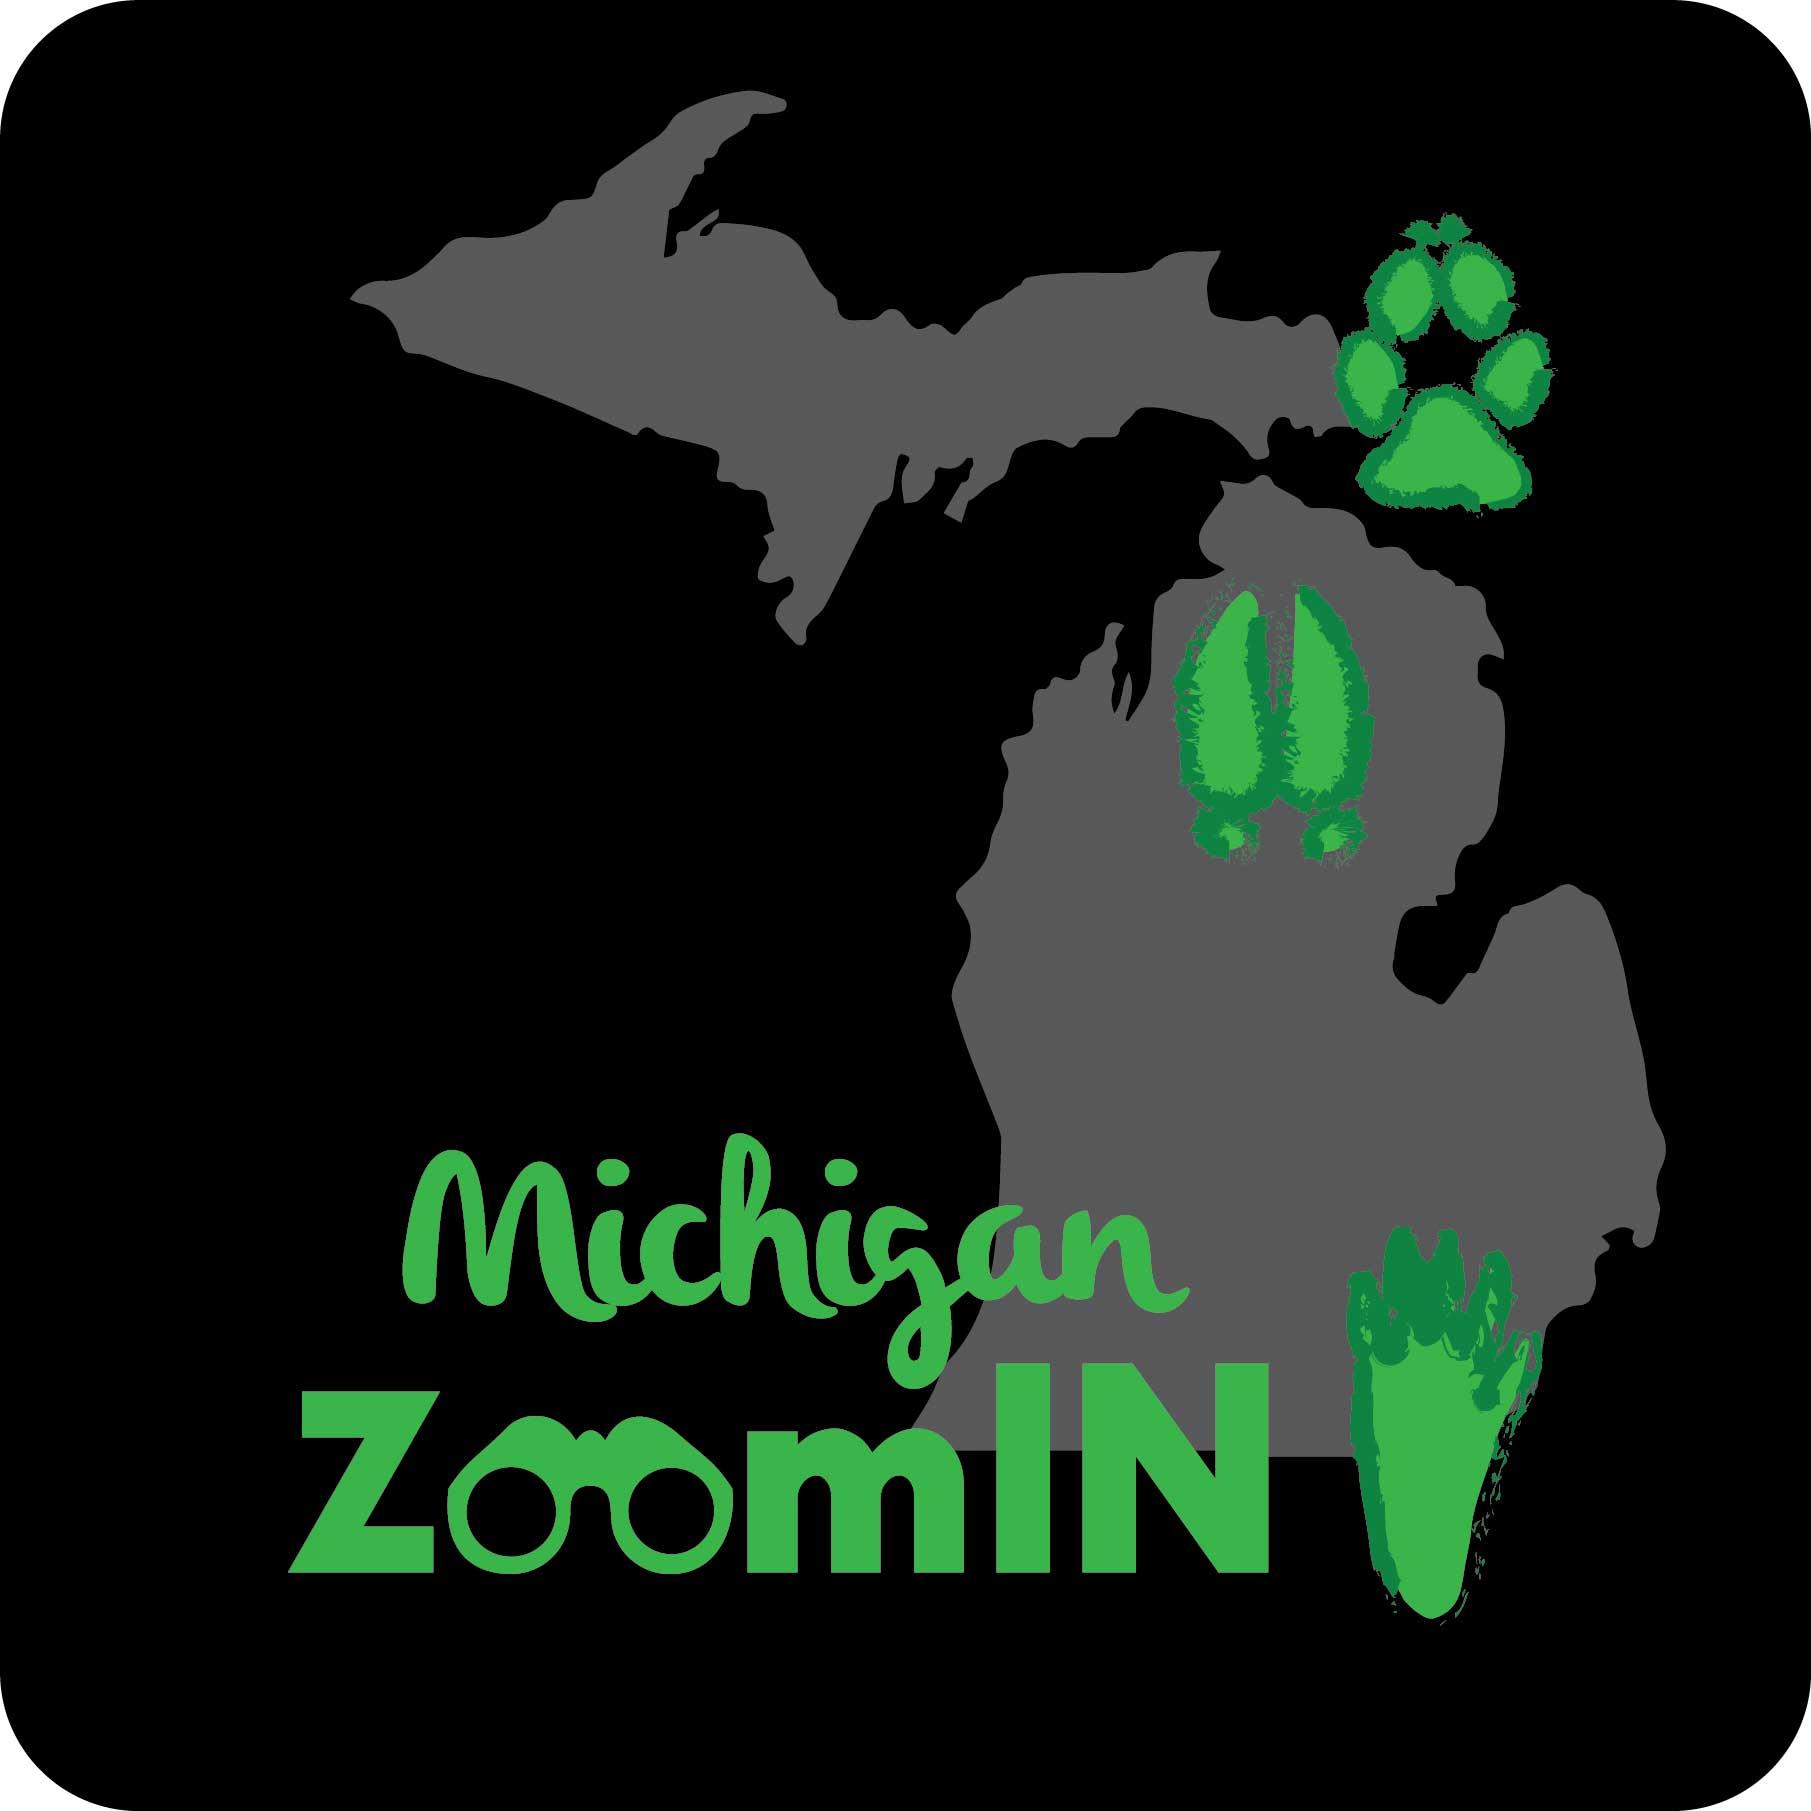 Michigan ZoomIN logo